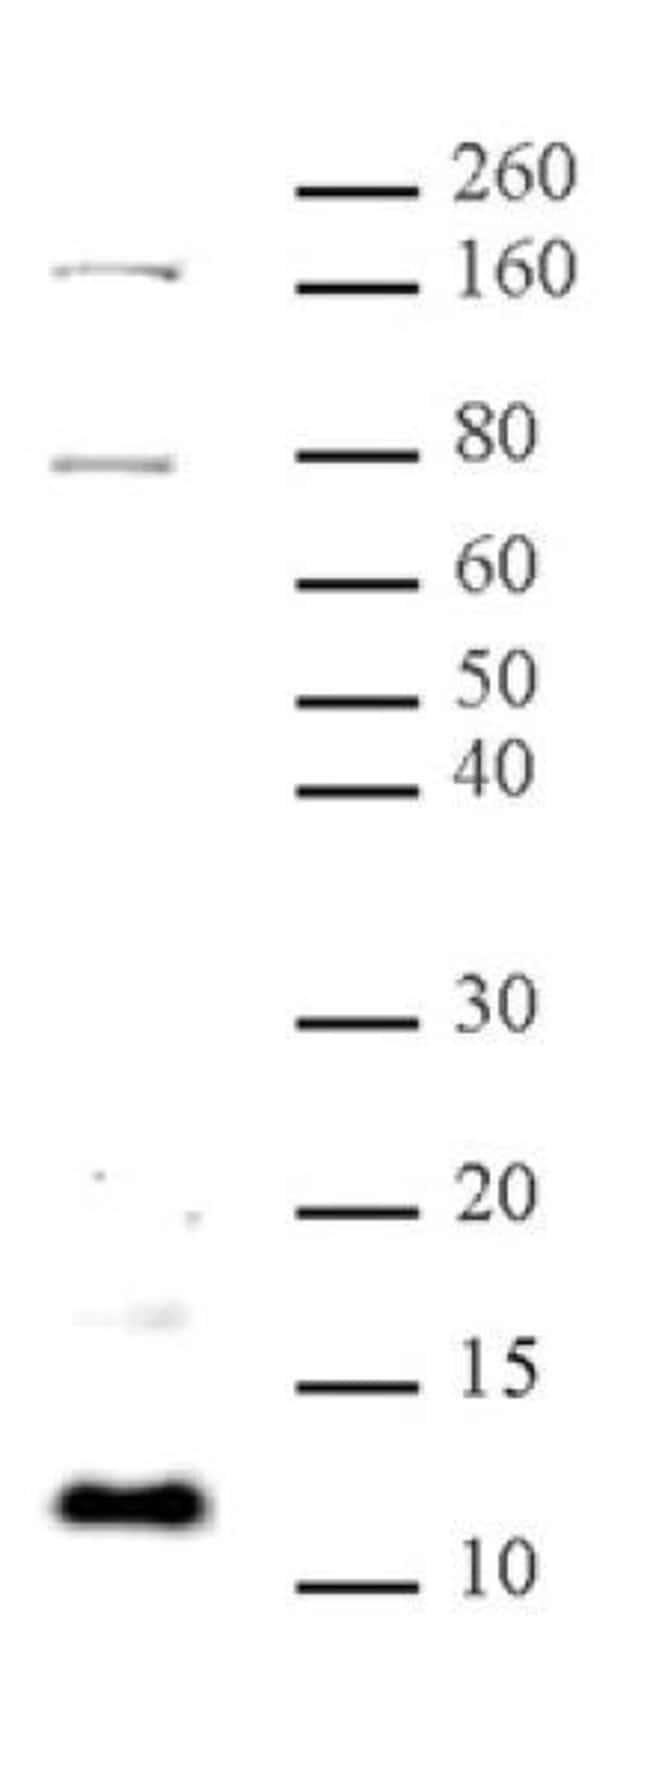 Histone H4K31me1 Rabbit anti-Human, Unconjugated, Polyclonal, Active Motif:Antibodies:Primary